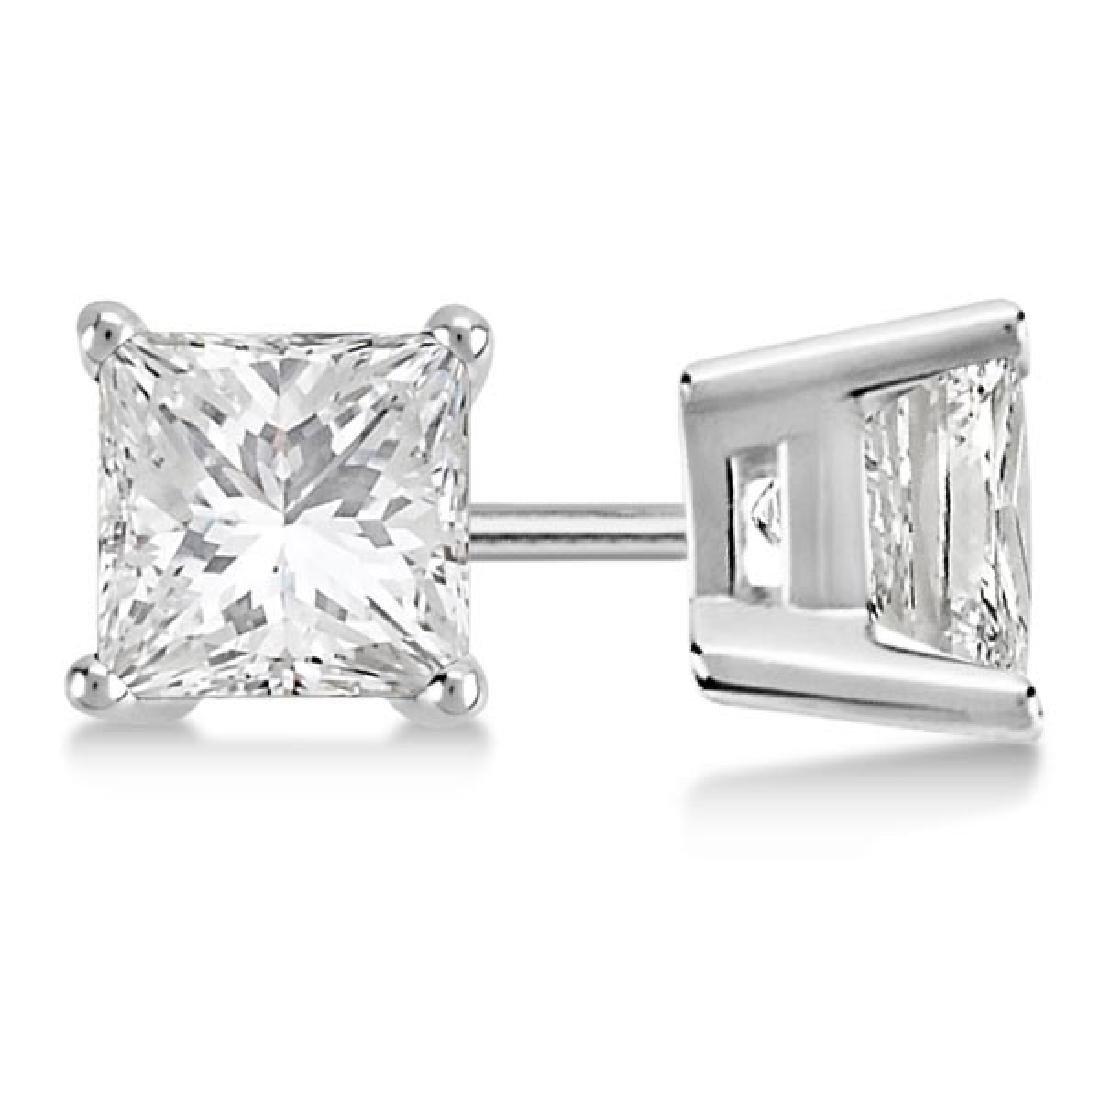 Certified 1.13 CTW Princess Diamond Stud Earrings H/SI2